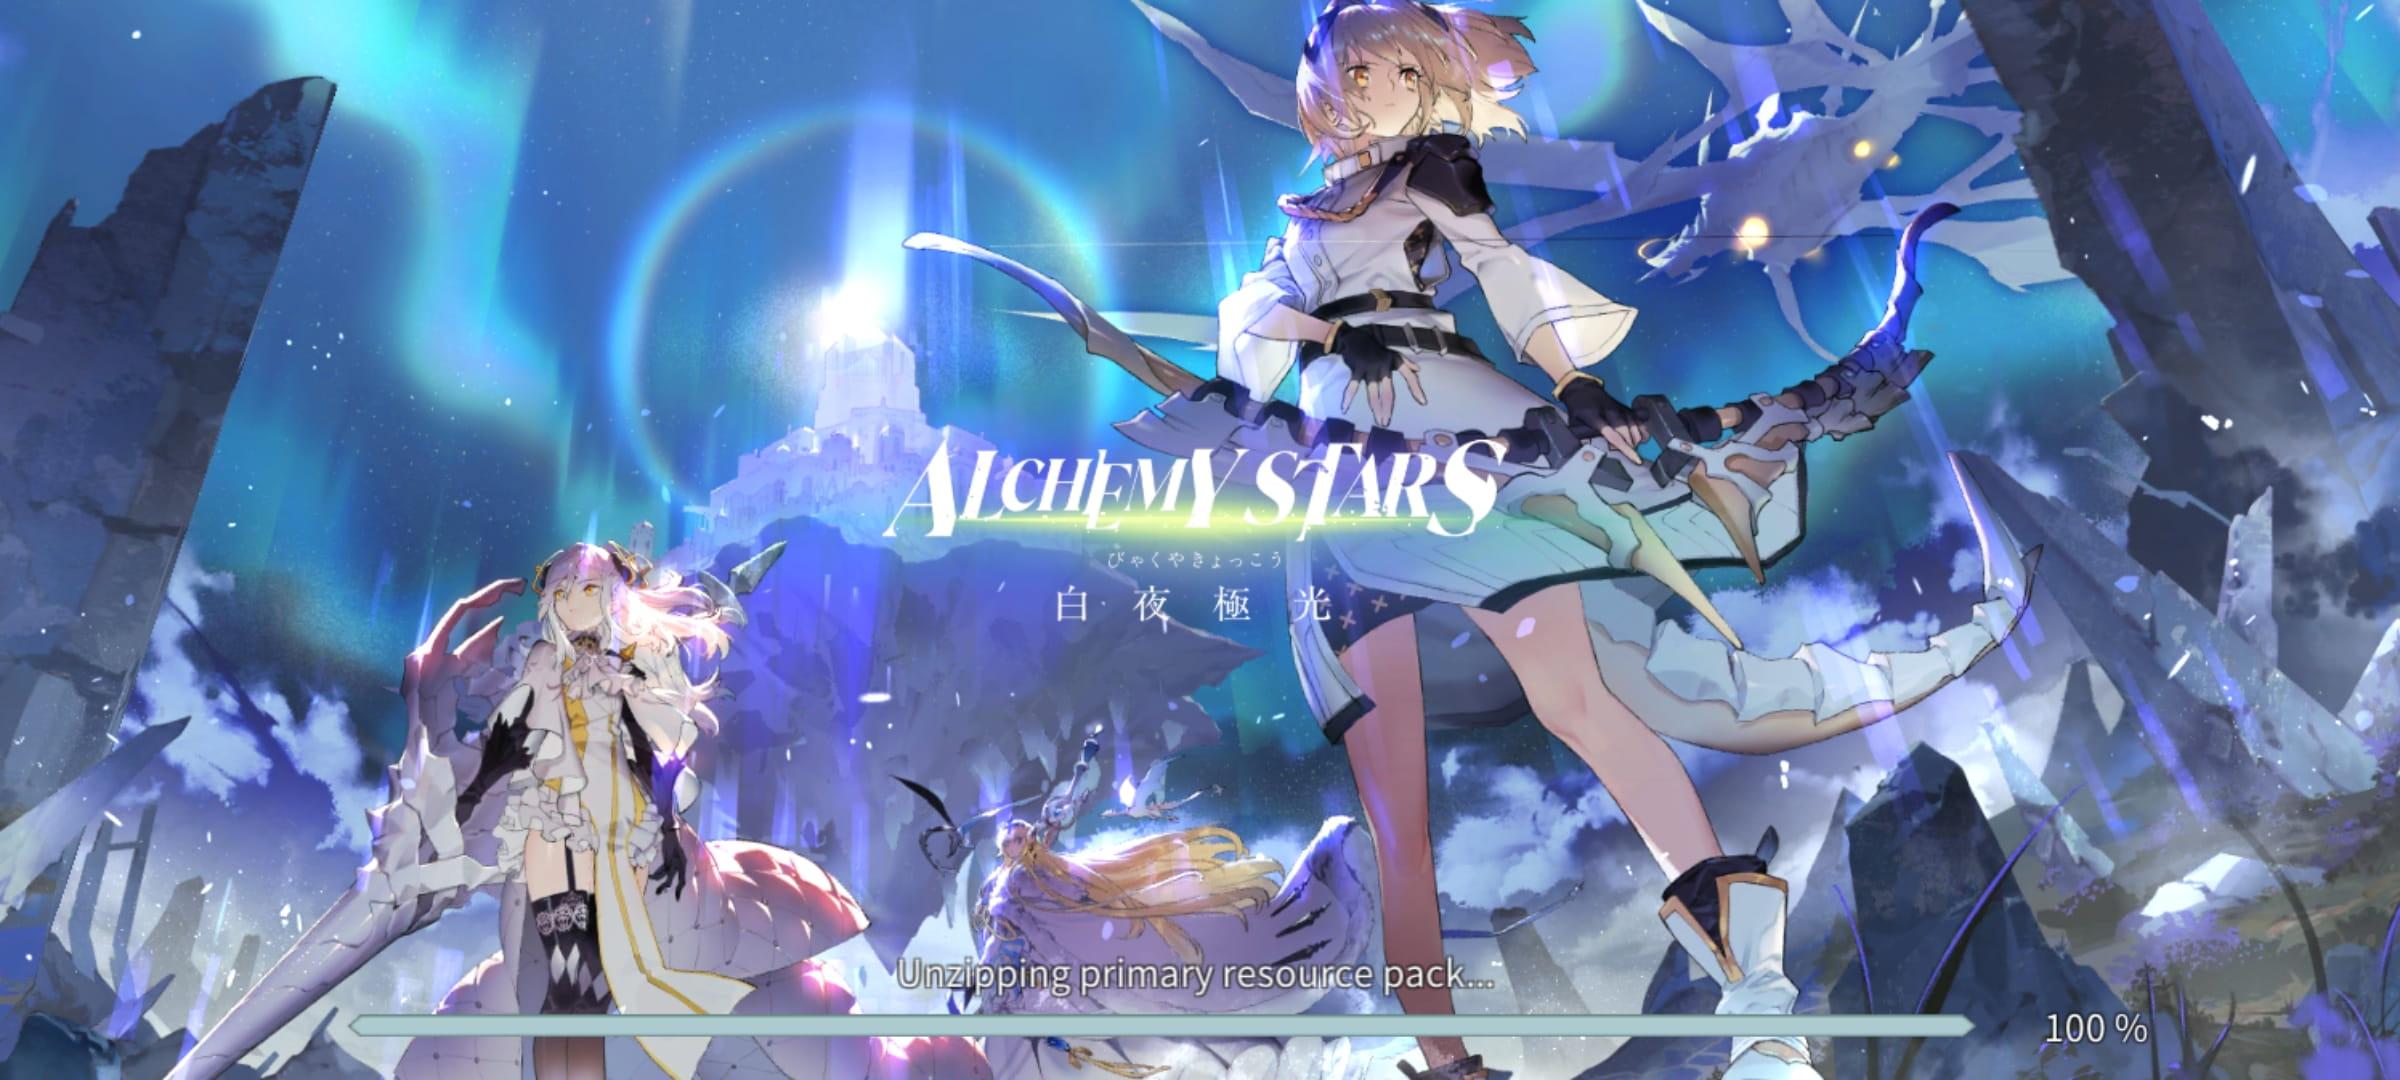 Alchemy Stars Reroll Guide – Gamers Wiki